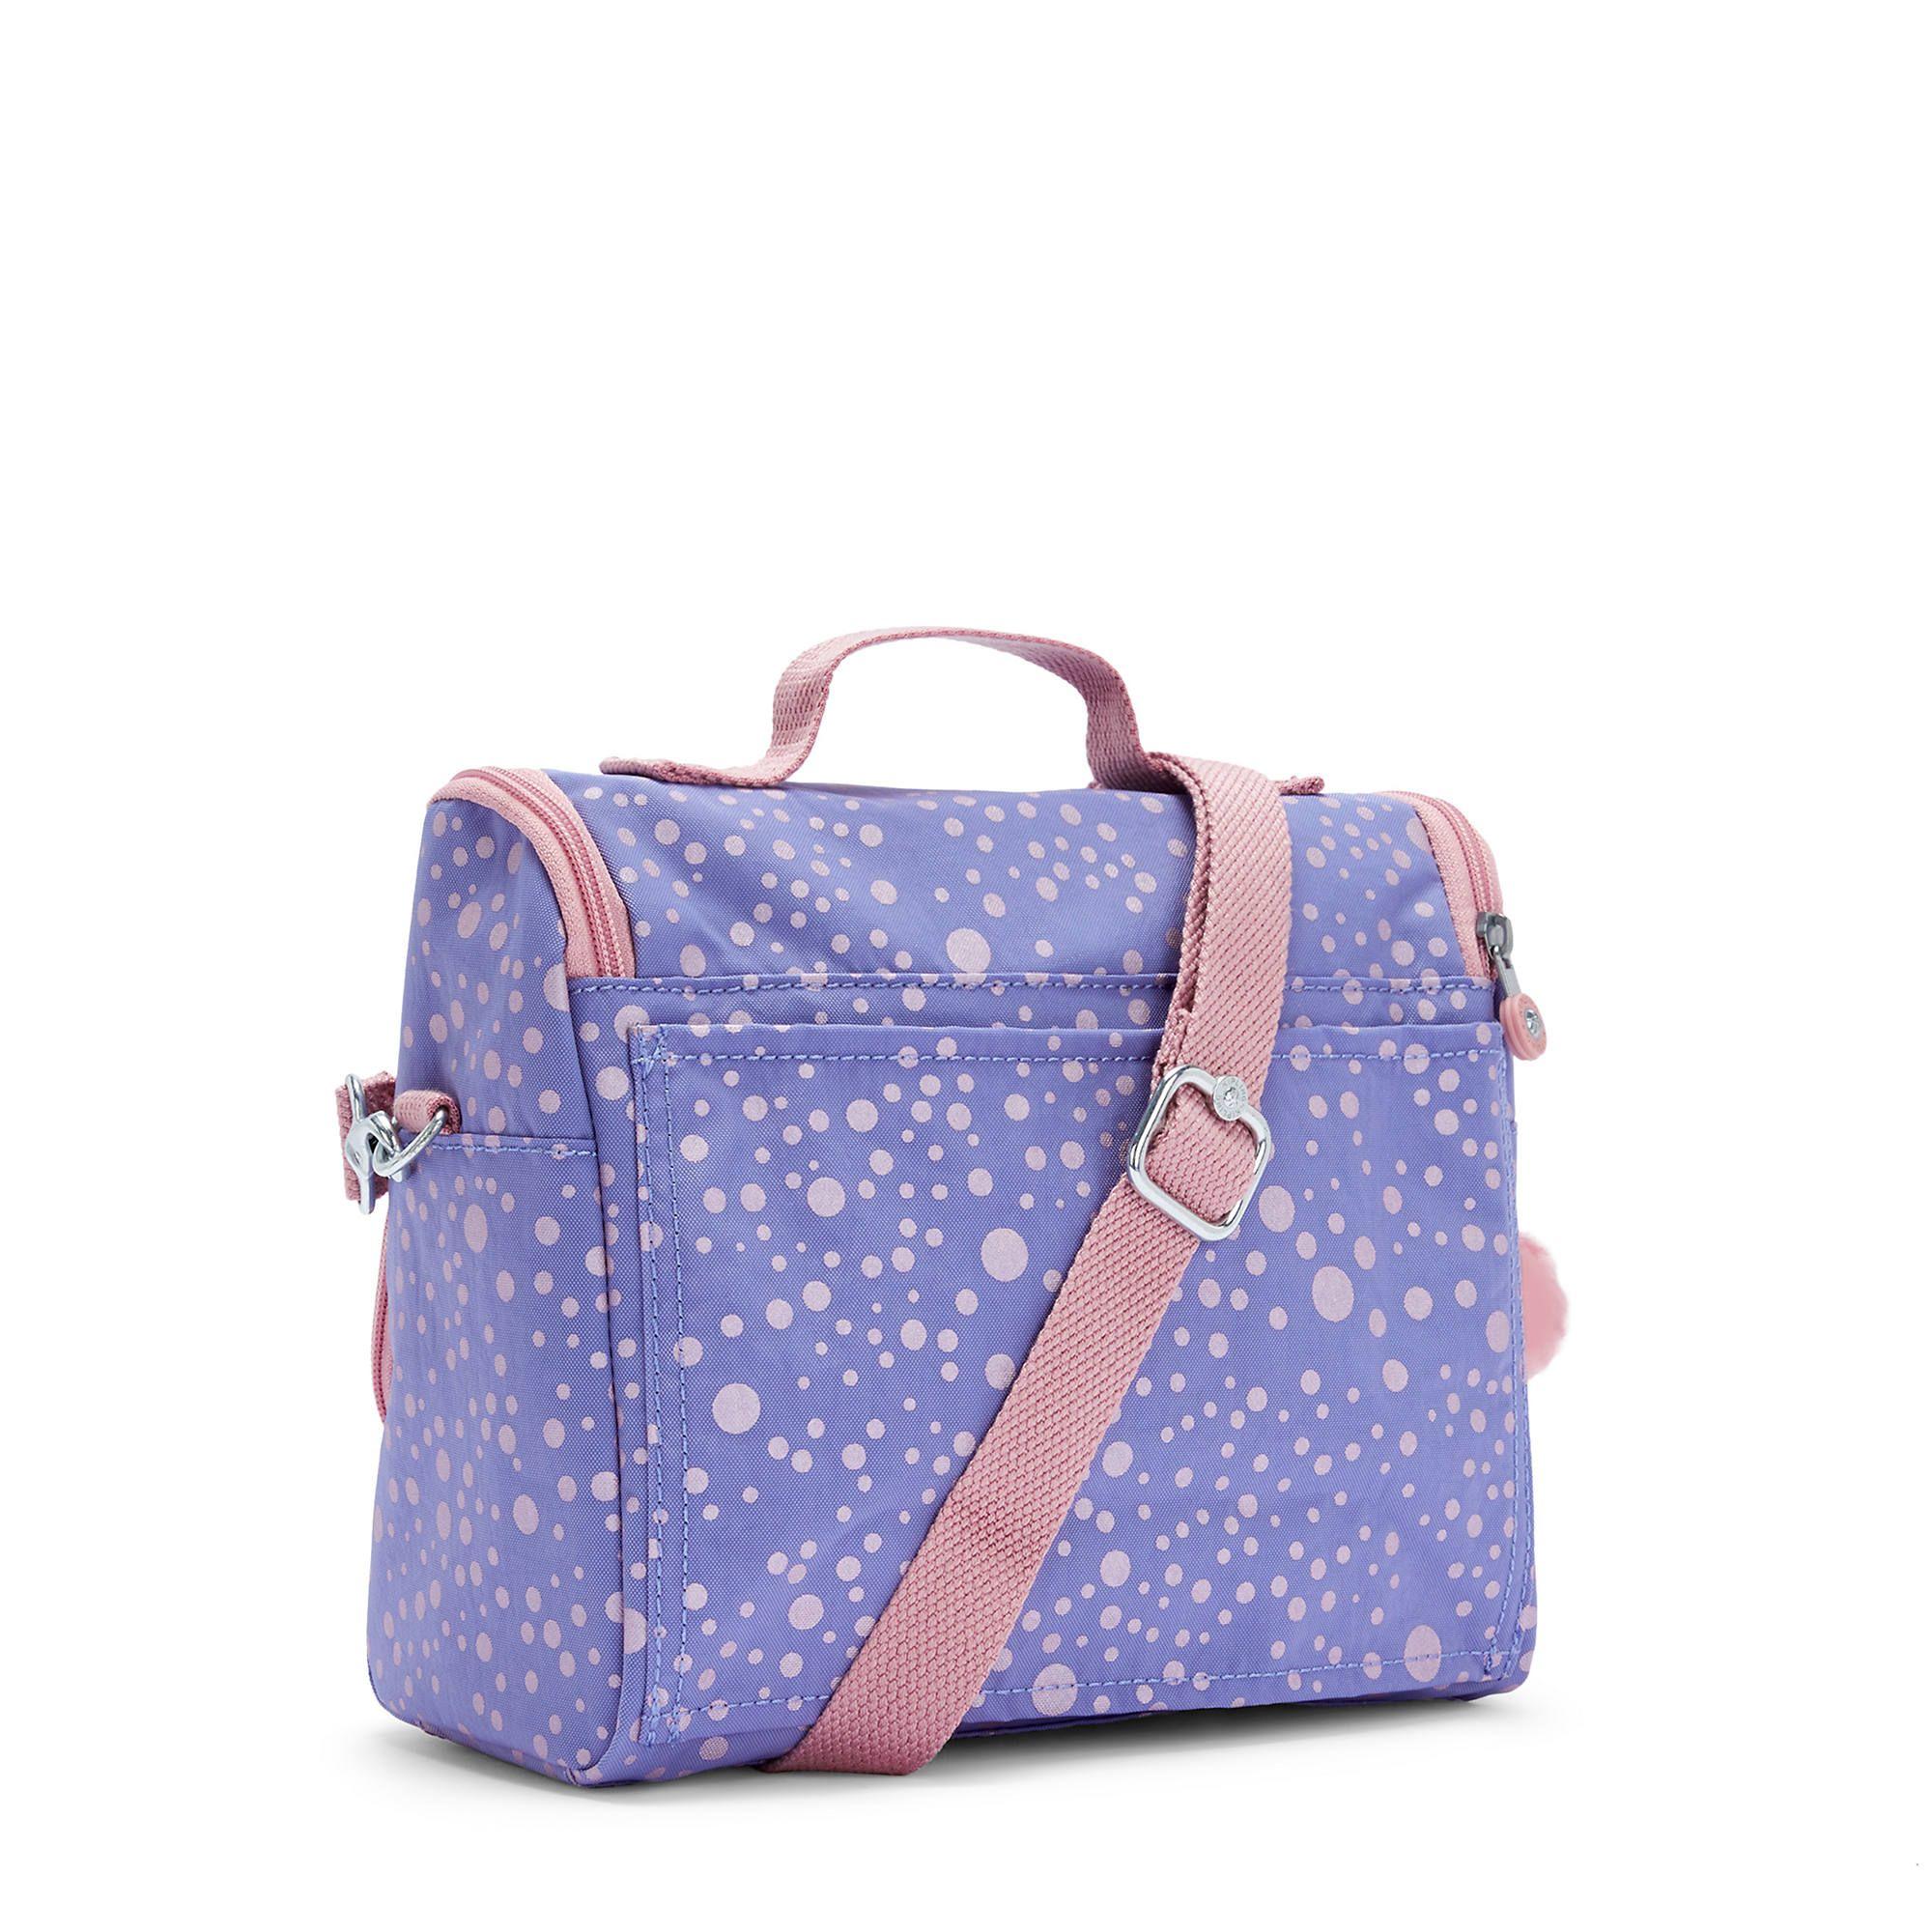 Lancheira New Kichirou Kipling Purple Twinkle